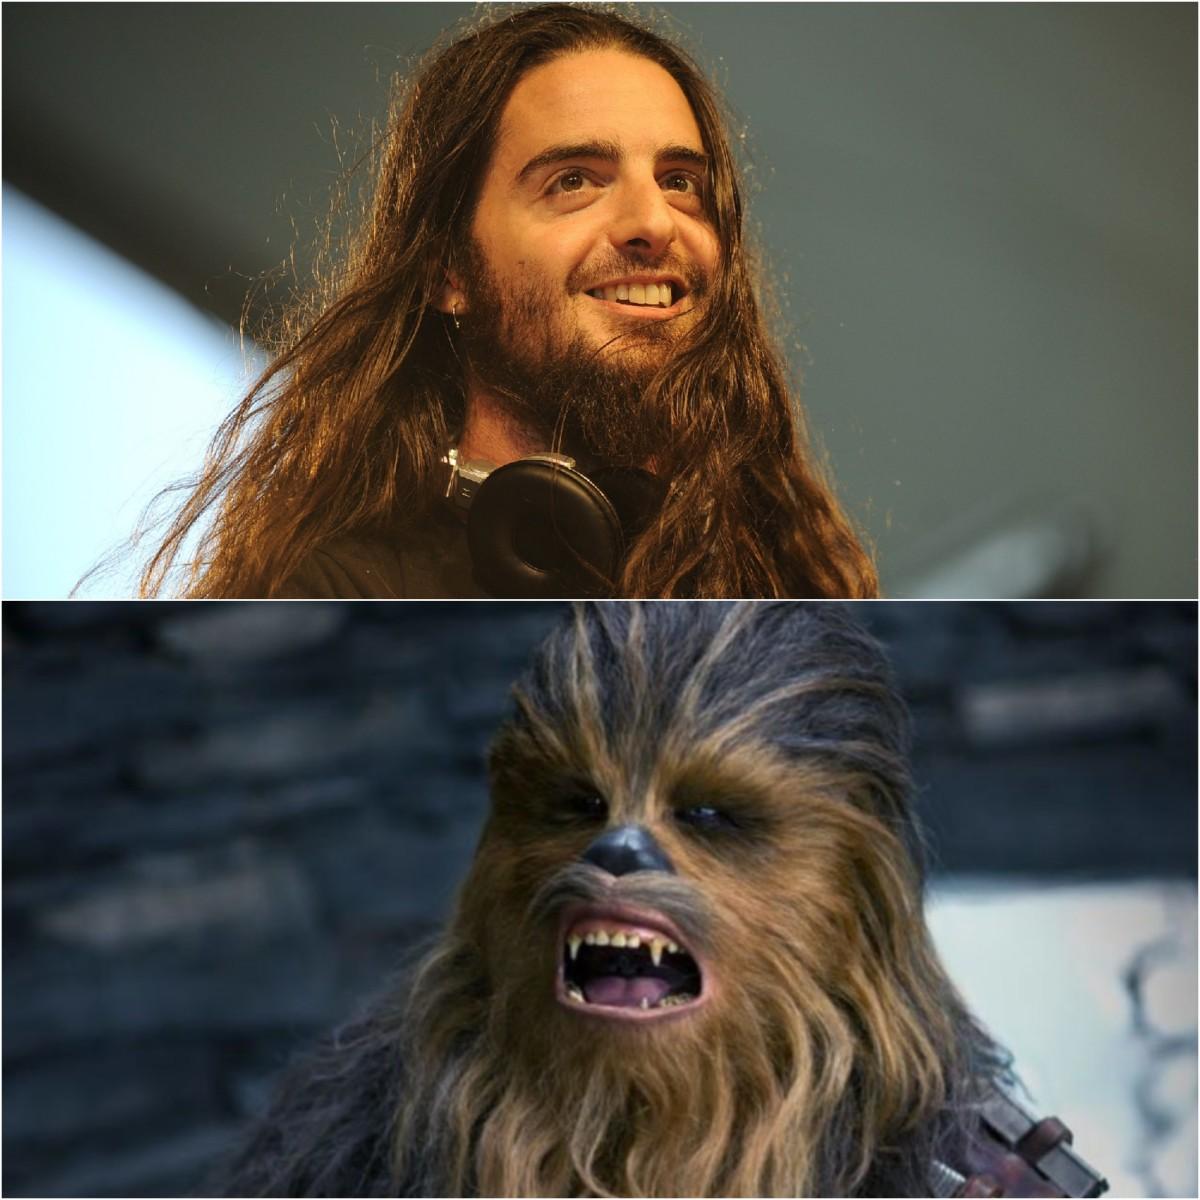 bassnectar chewbacca